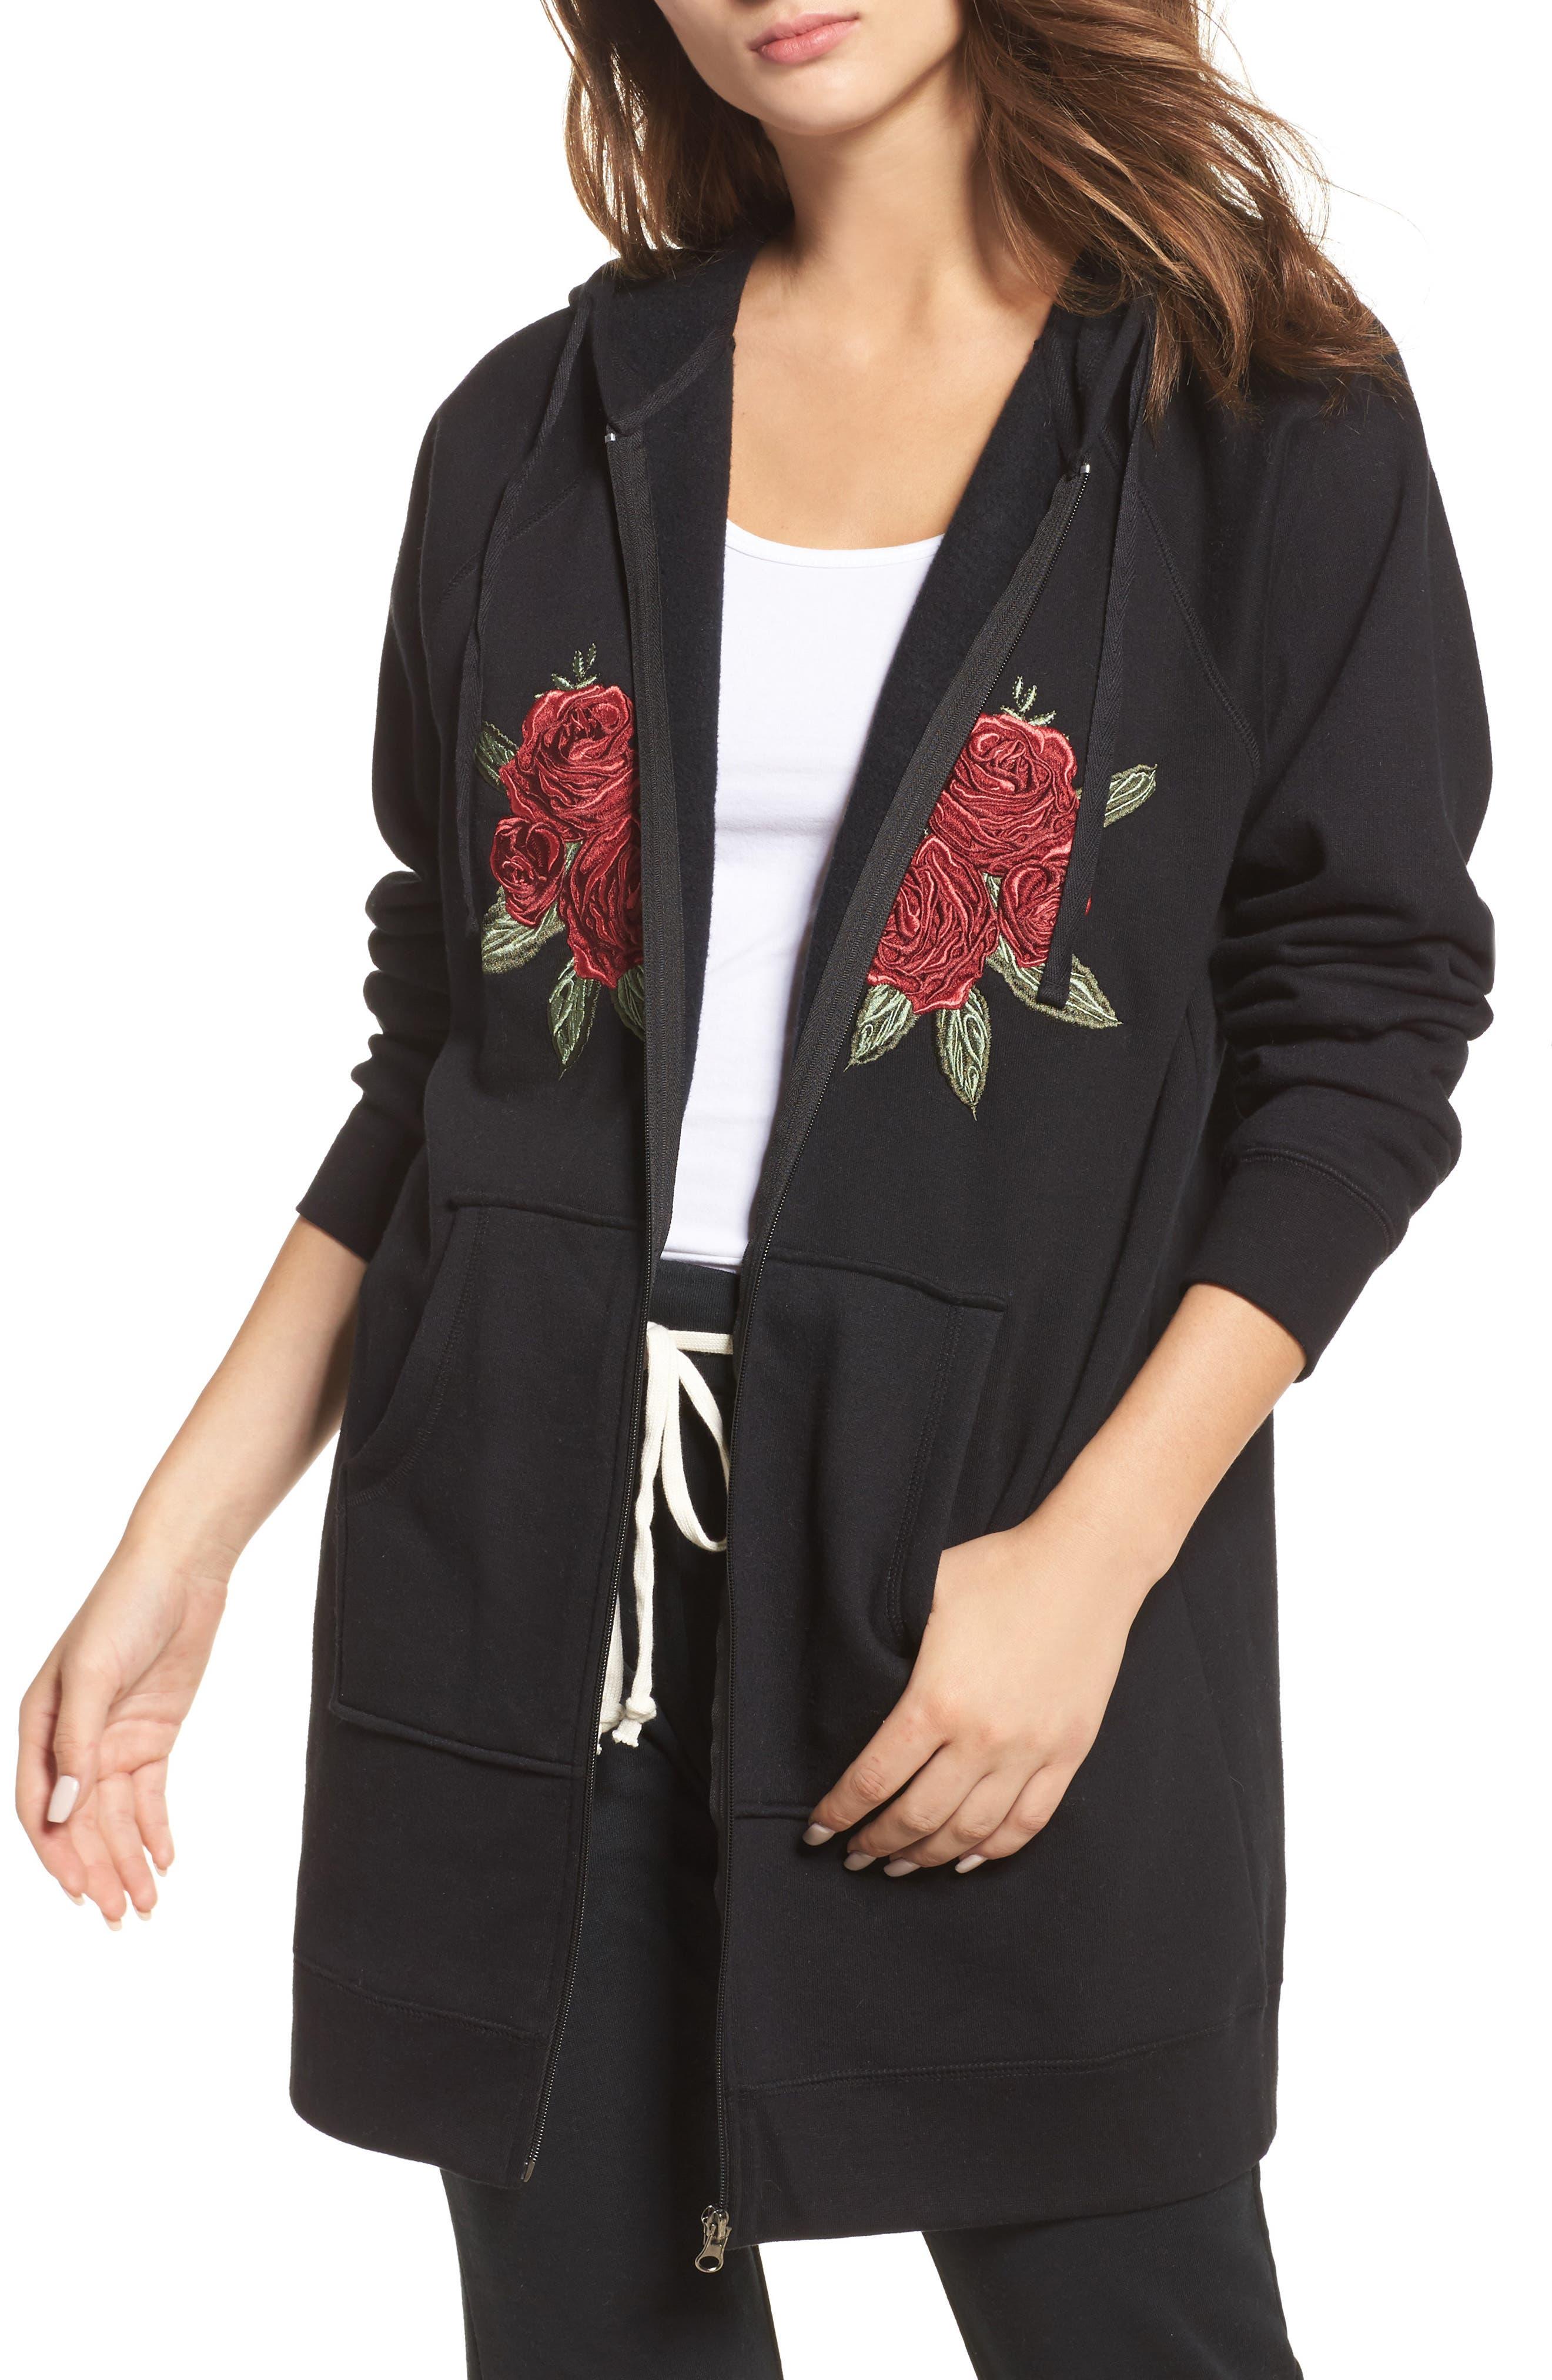 Alternate Image 1 Selected - BRUNETTE the Label Brunette Embroidered Zip Hoodie